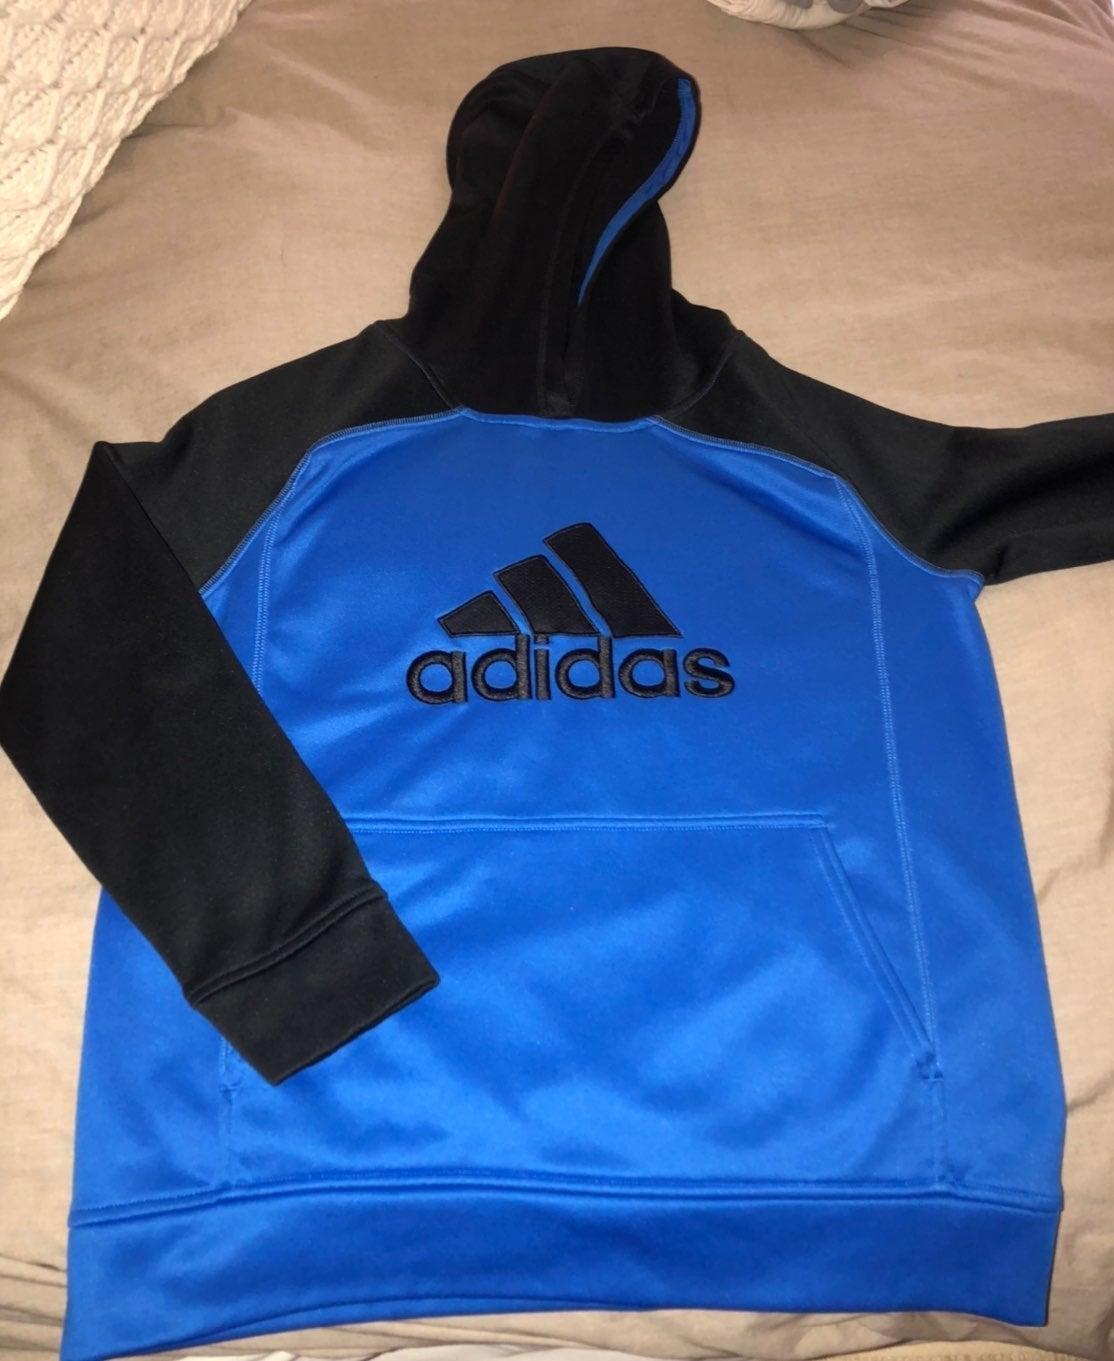 Adidas youth Large Hoodie